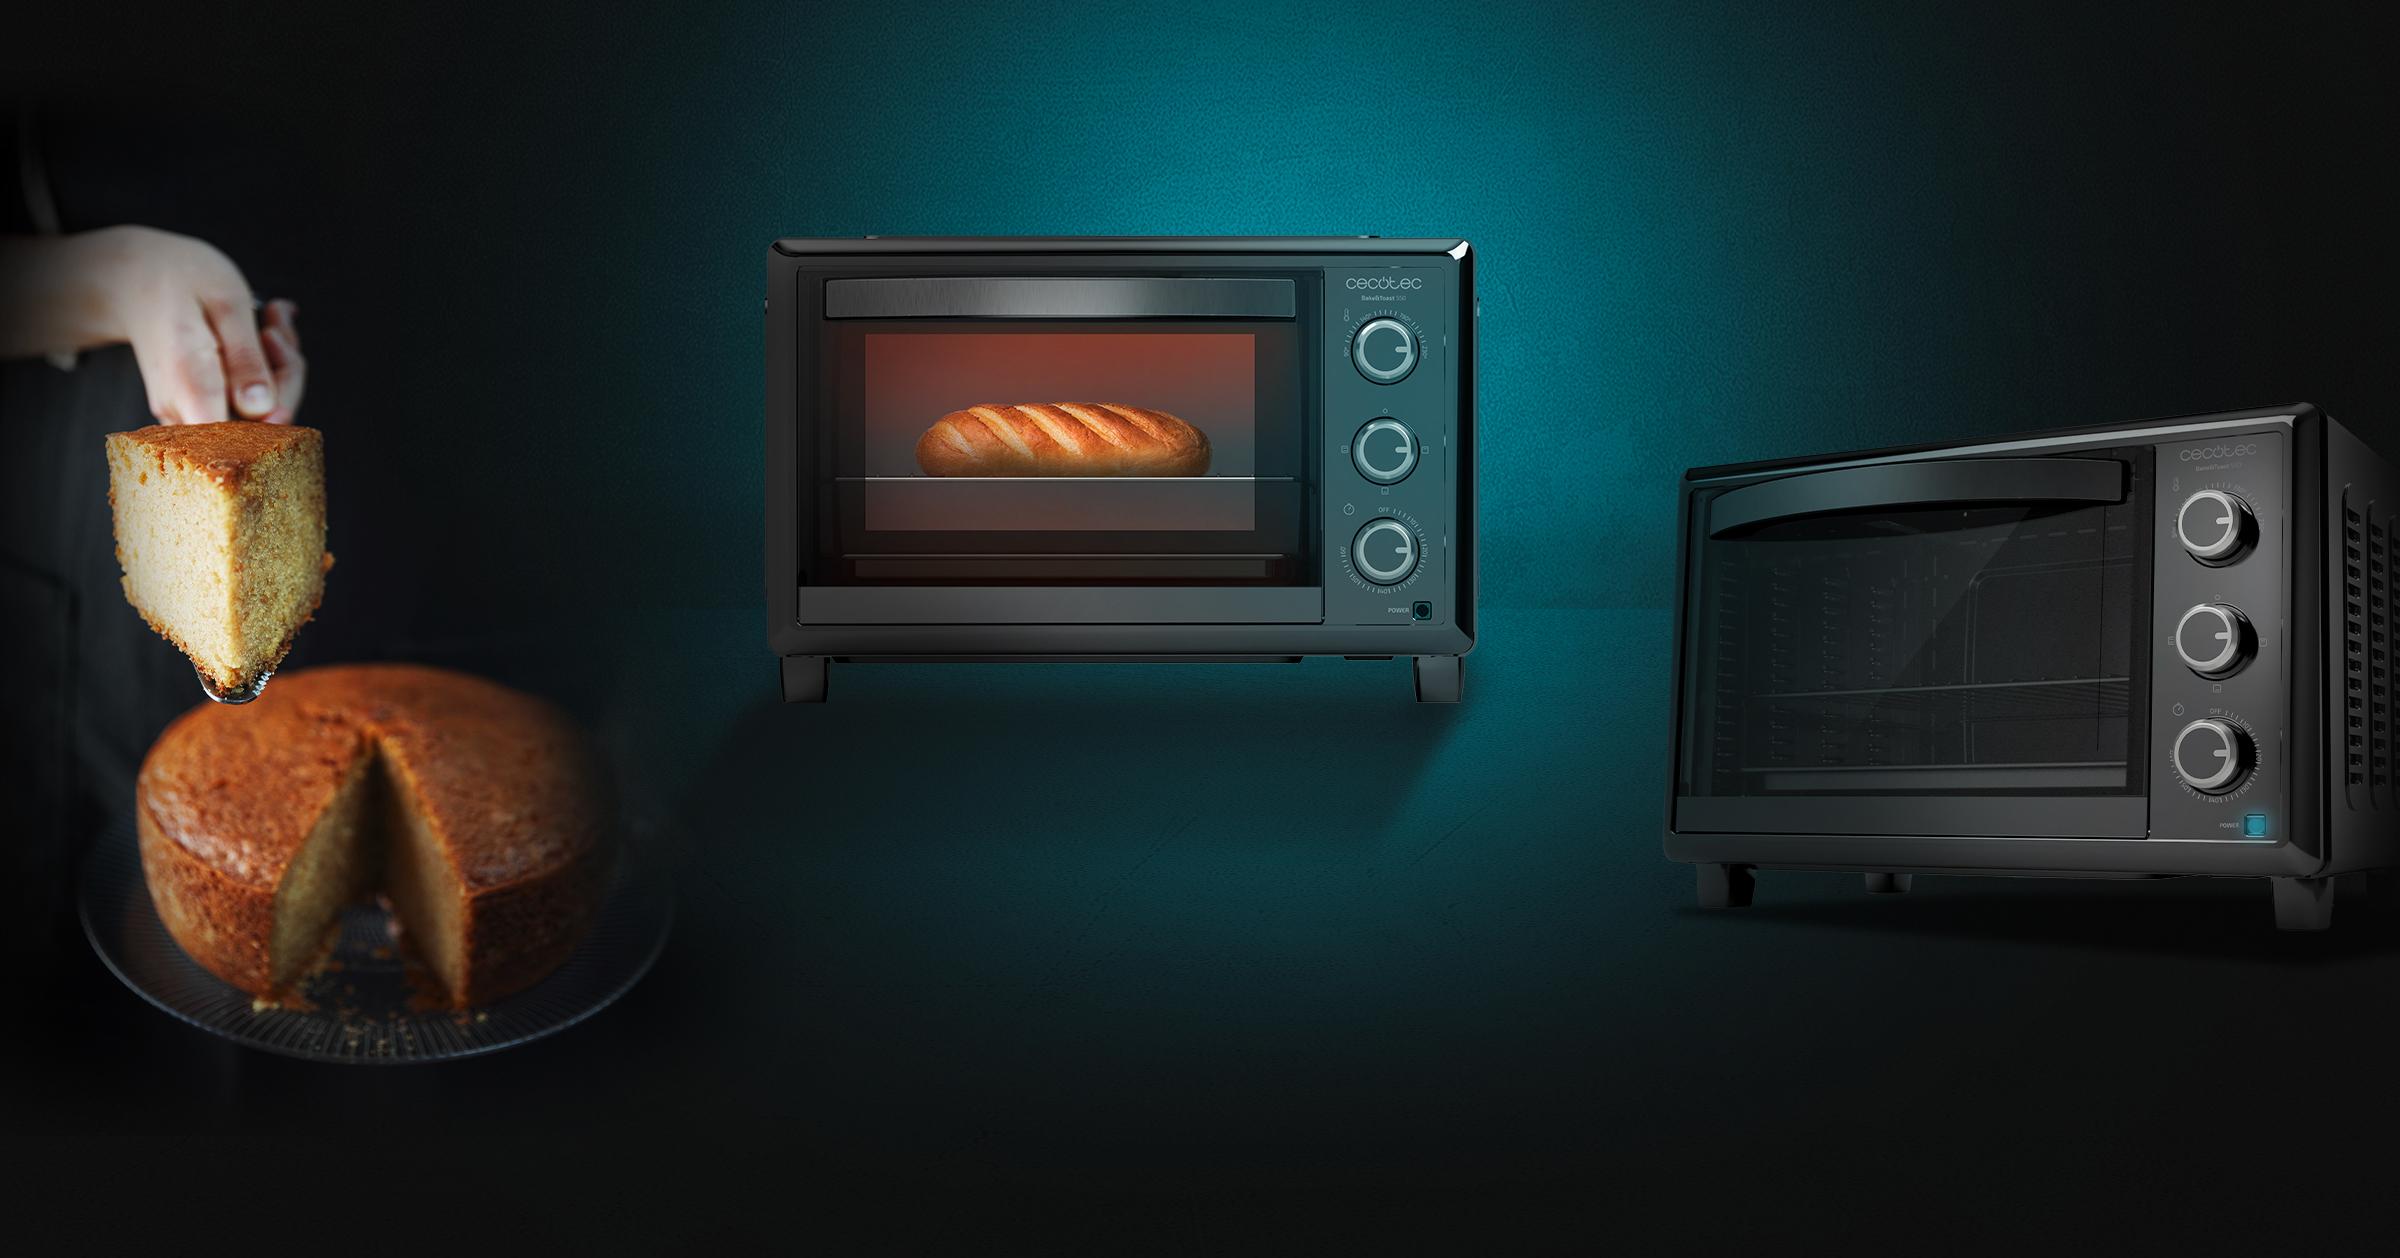 ImageHL_2203_Bake&Toast550_web_cecotec_LB